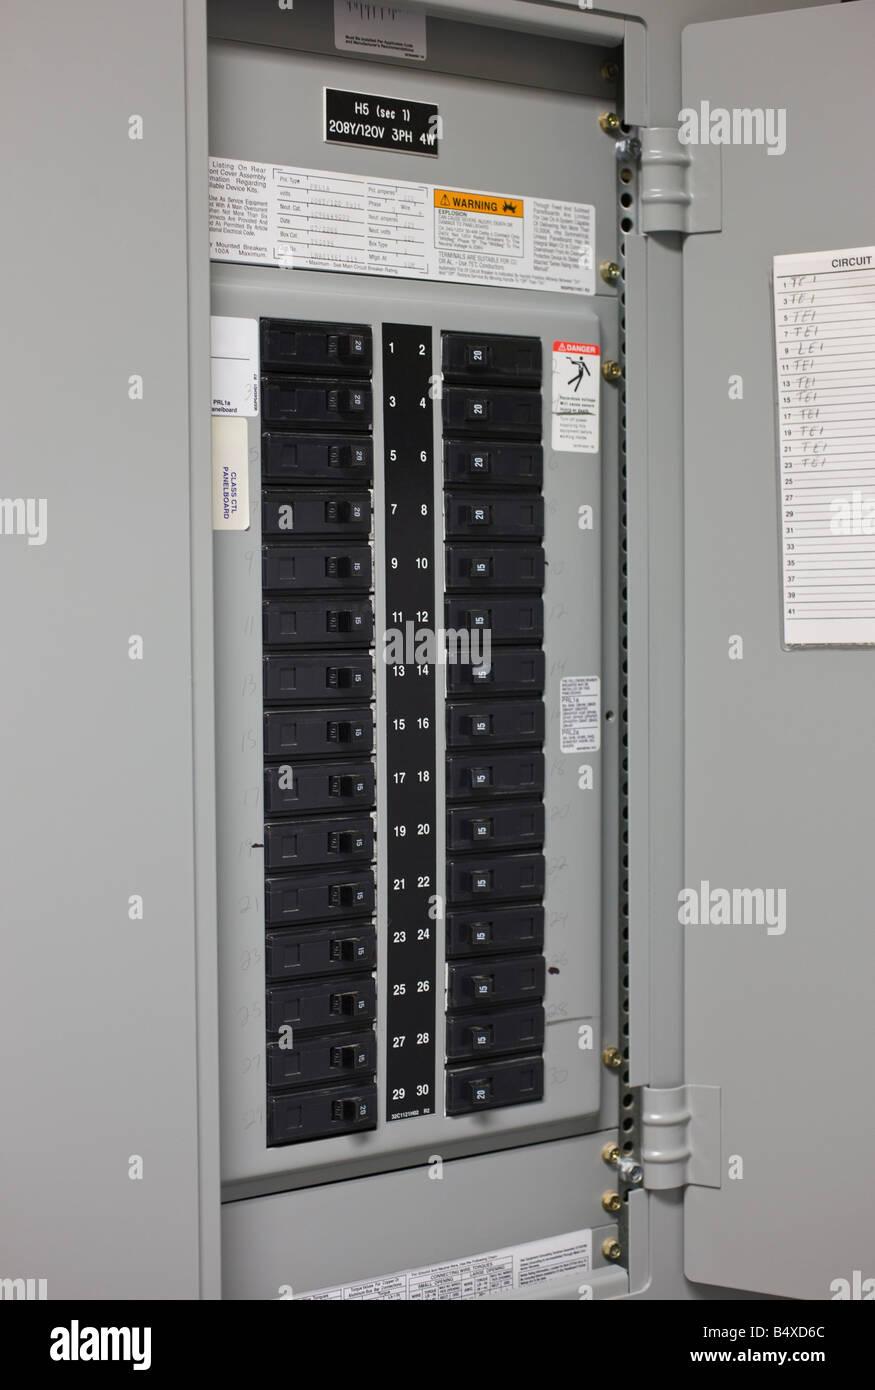 Elektrischer Schutzschalter Stockbild